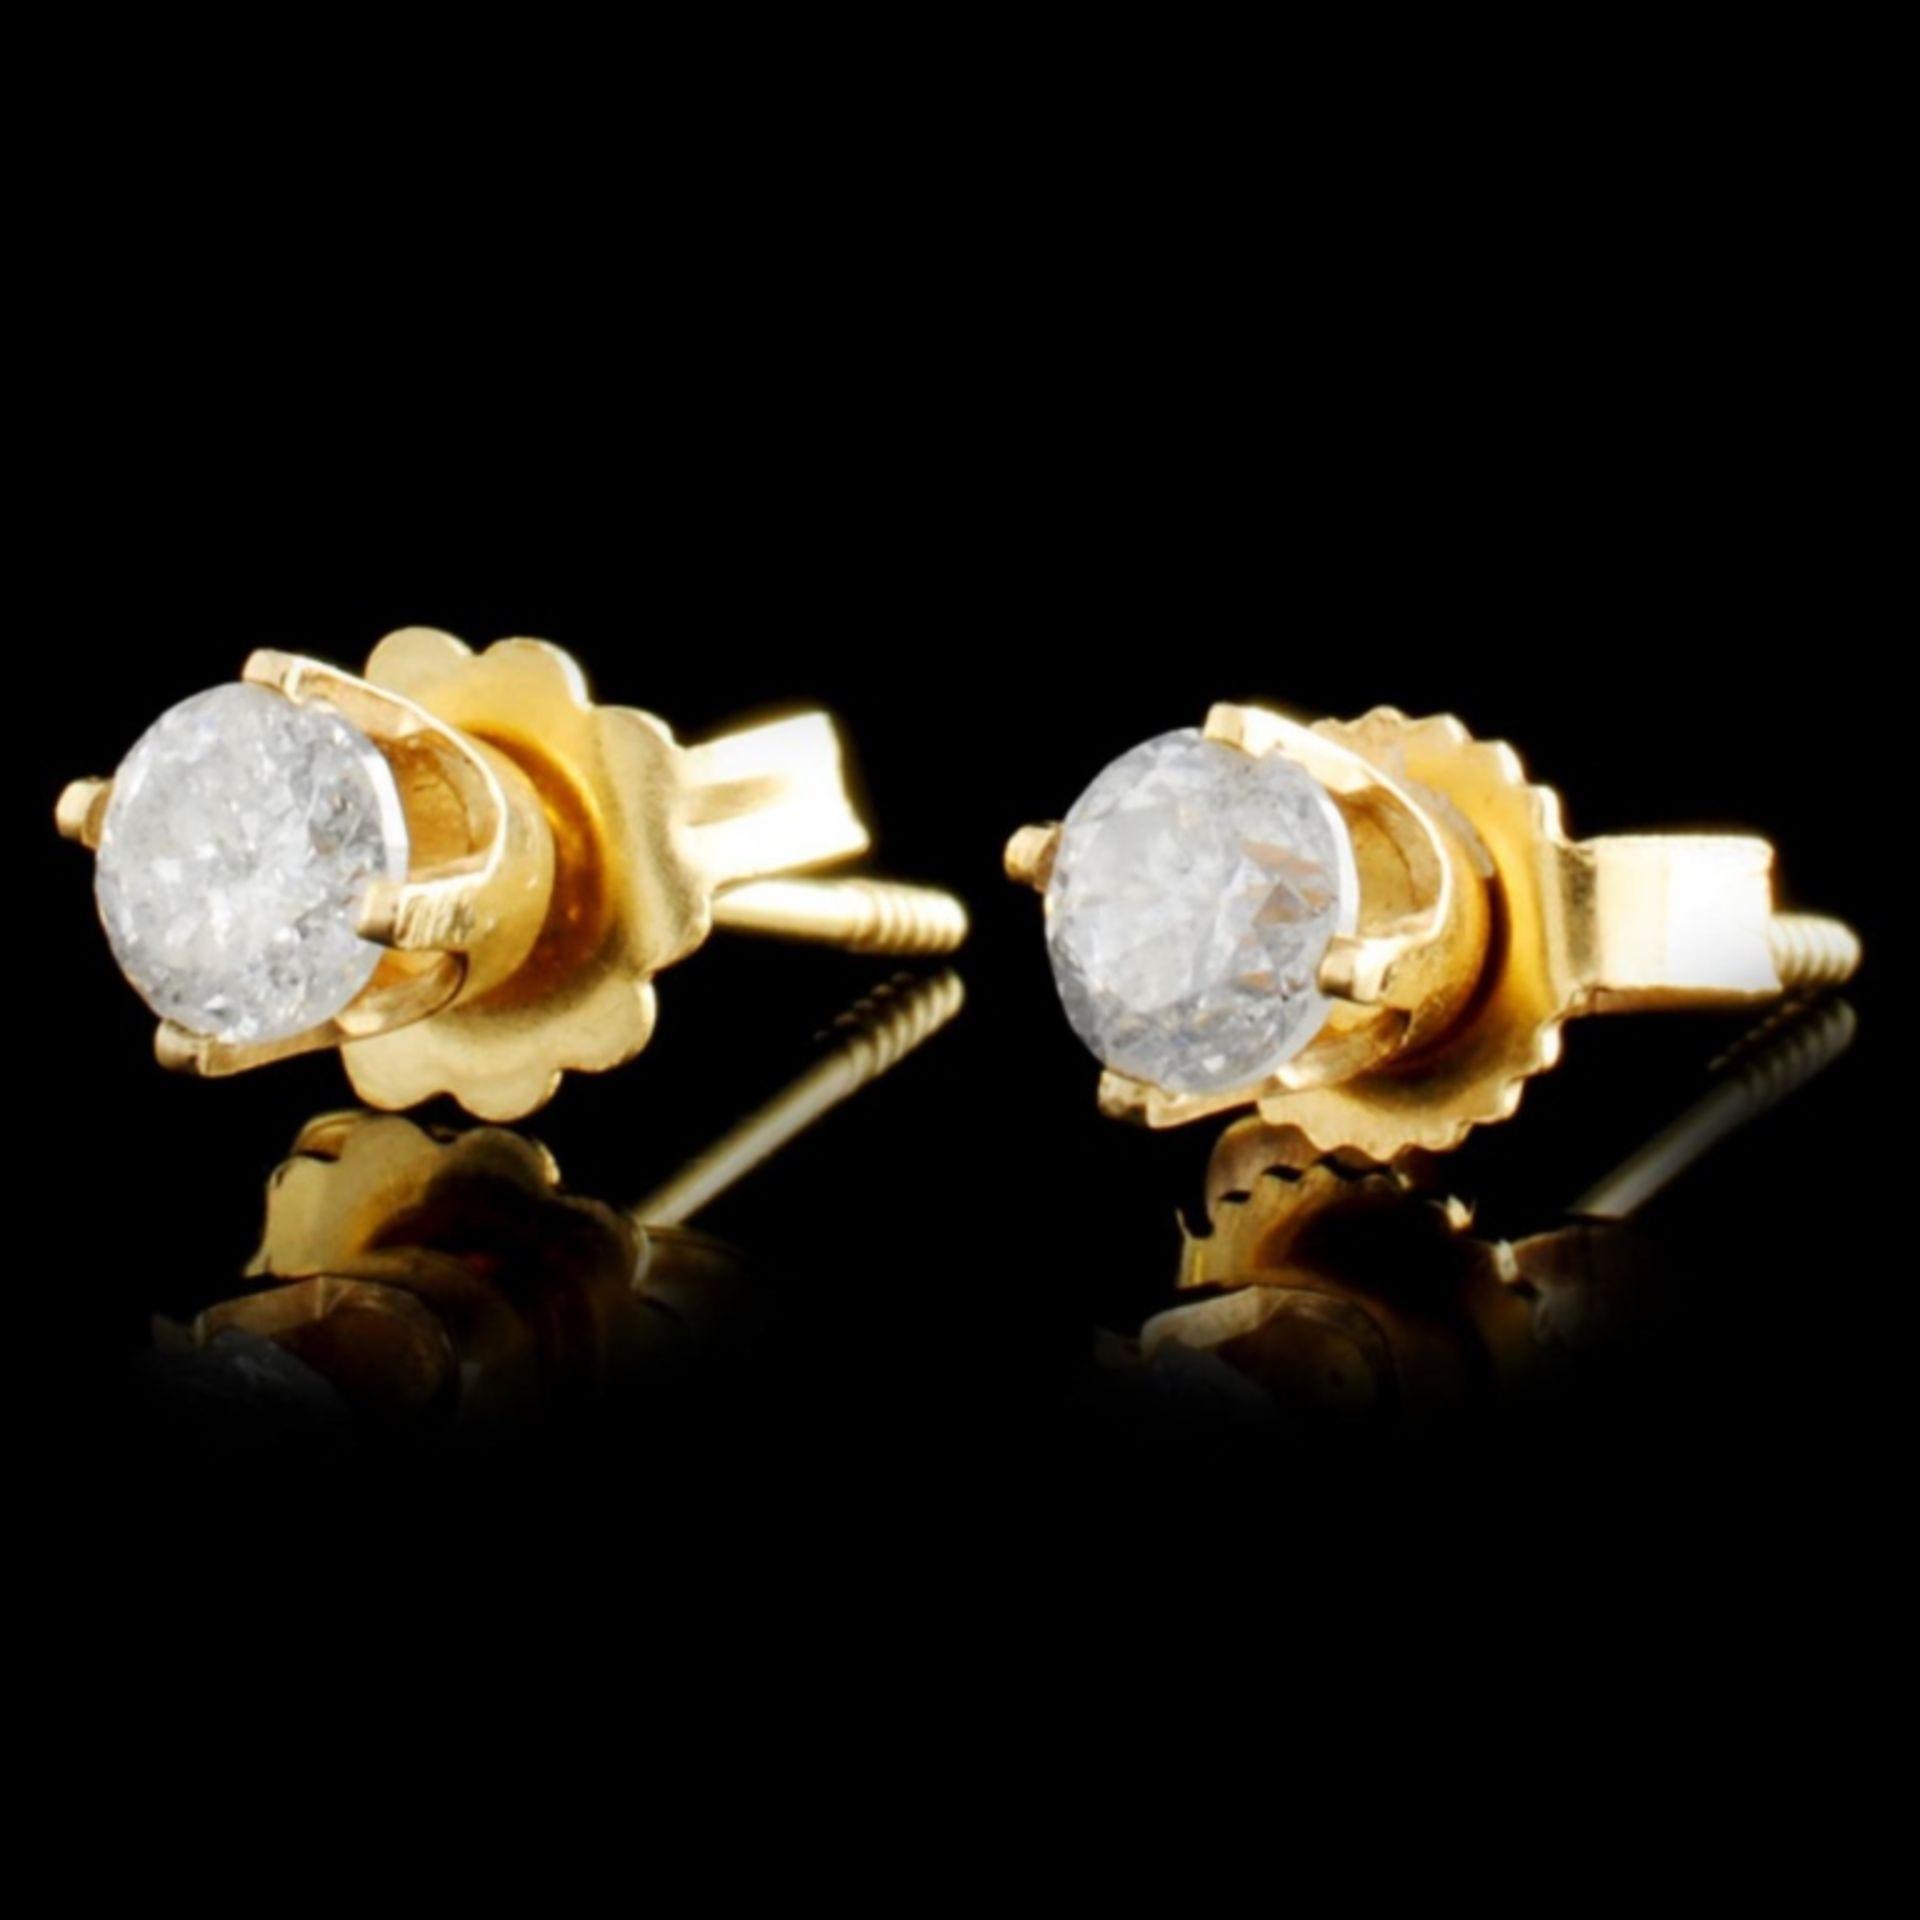 14K Gold 0.36ctw Diamond Earrings - Image 2 of 2